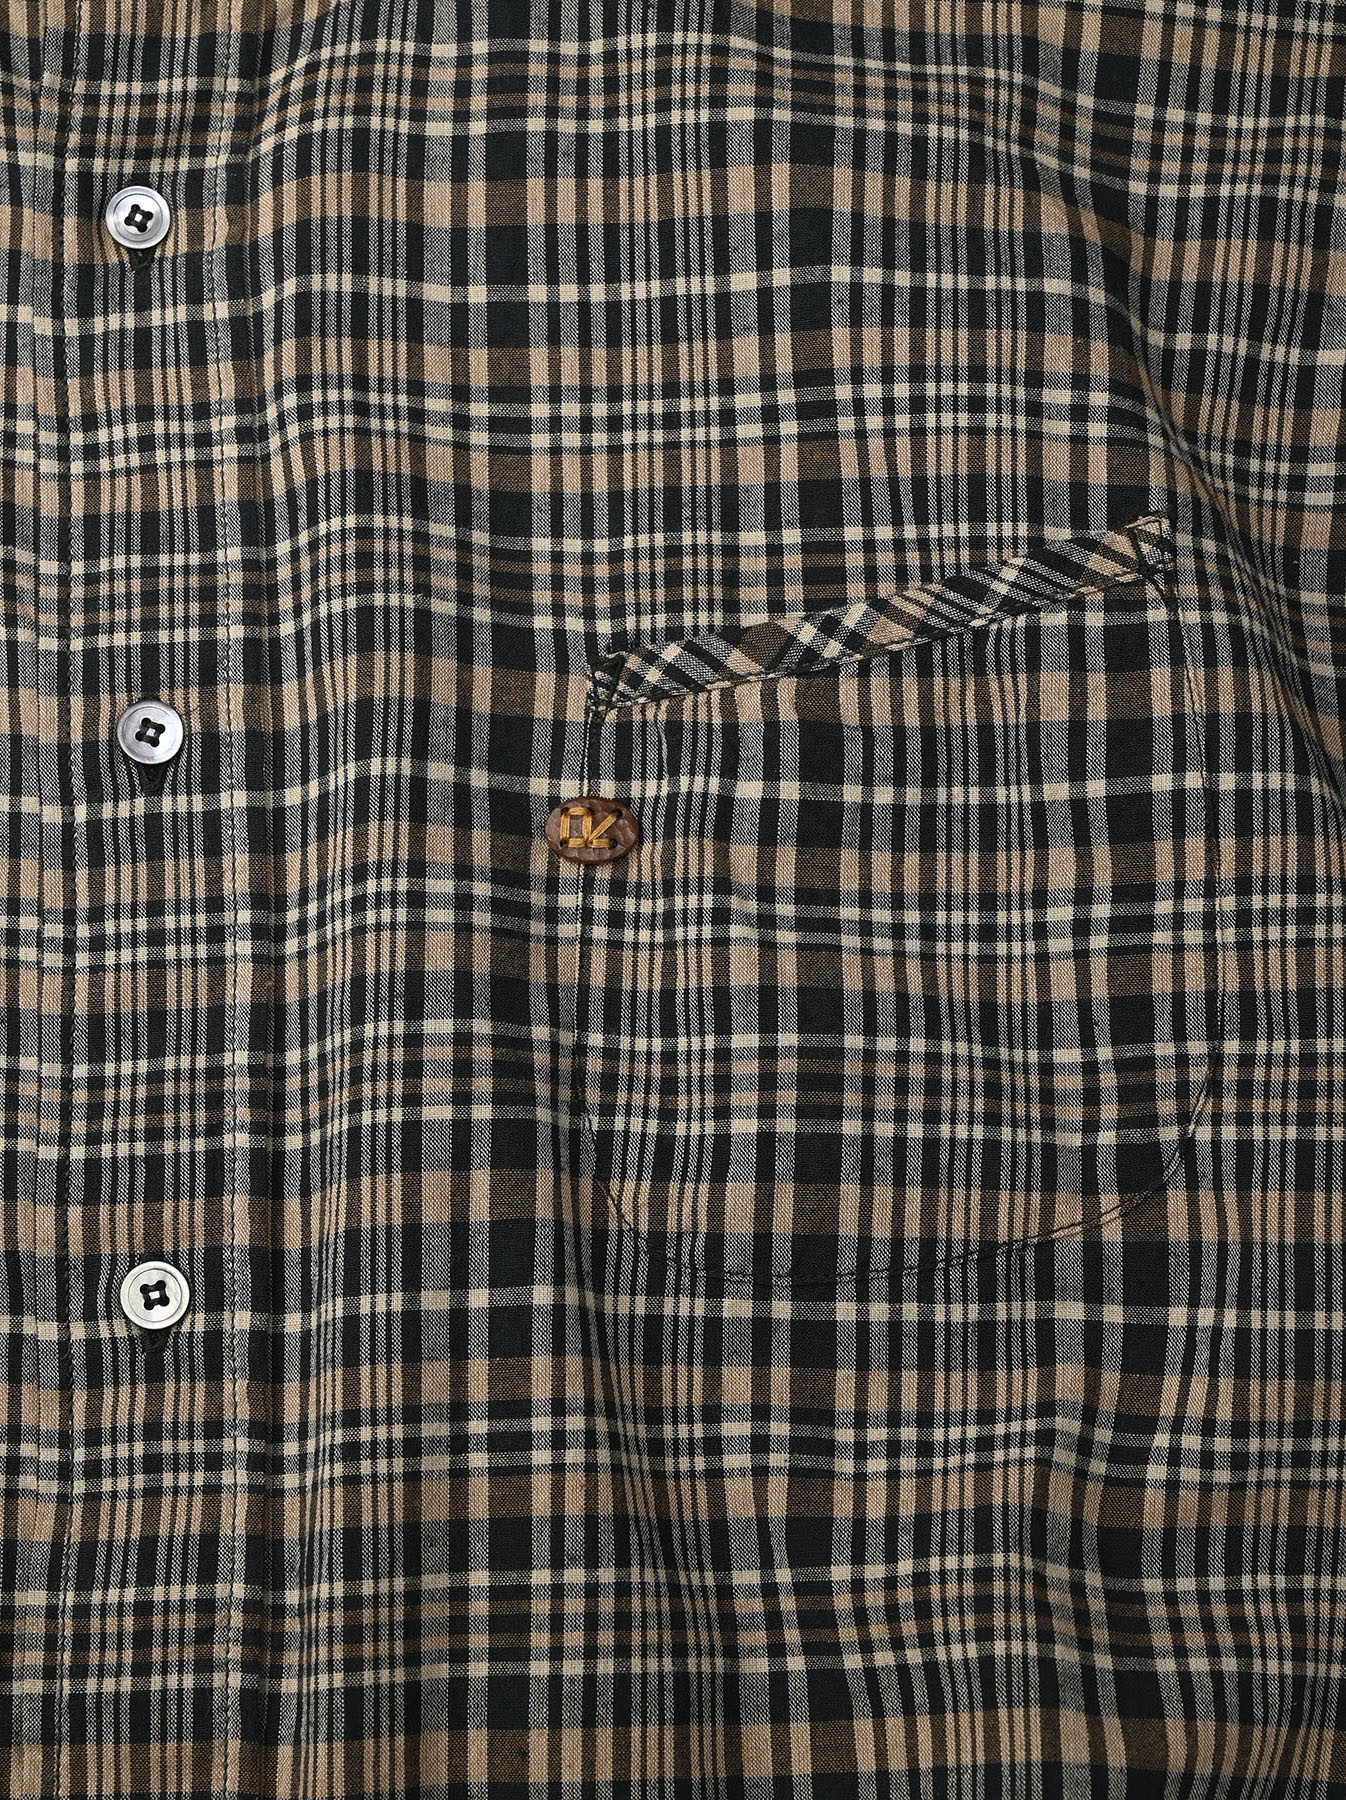 Indian Mugi-hira 908 Ocean Button Down Shirt (0421)-10